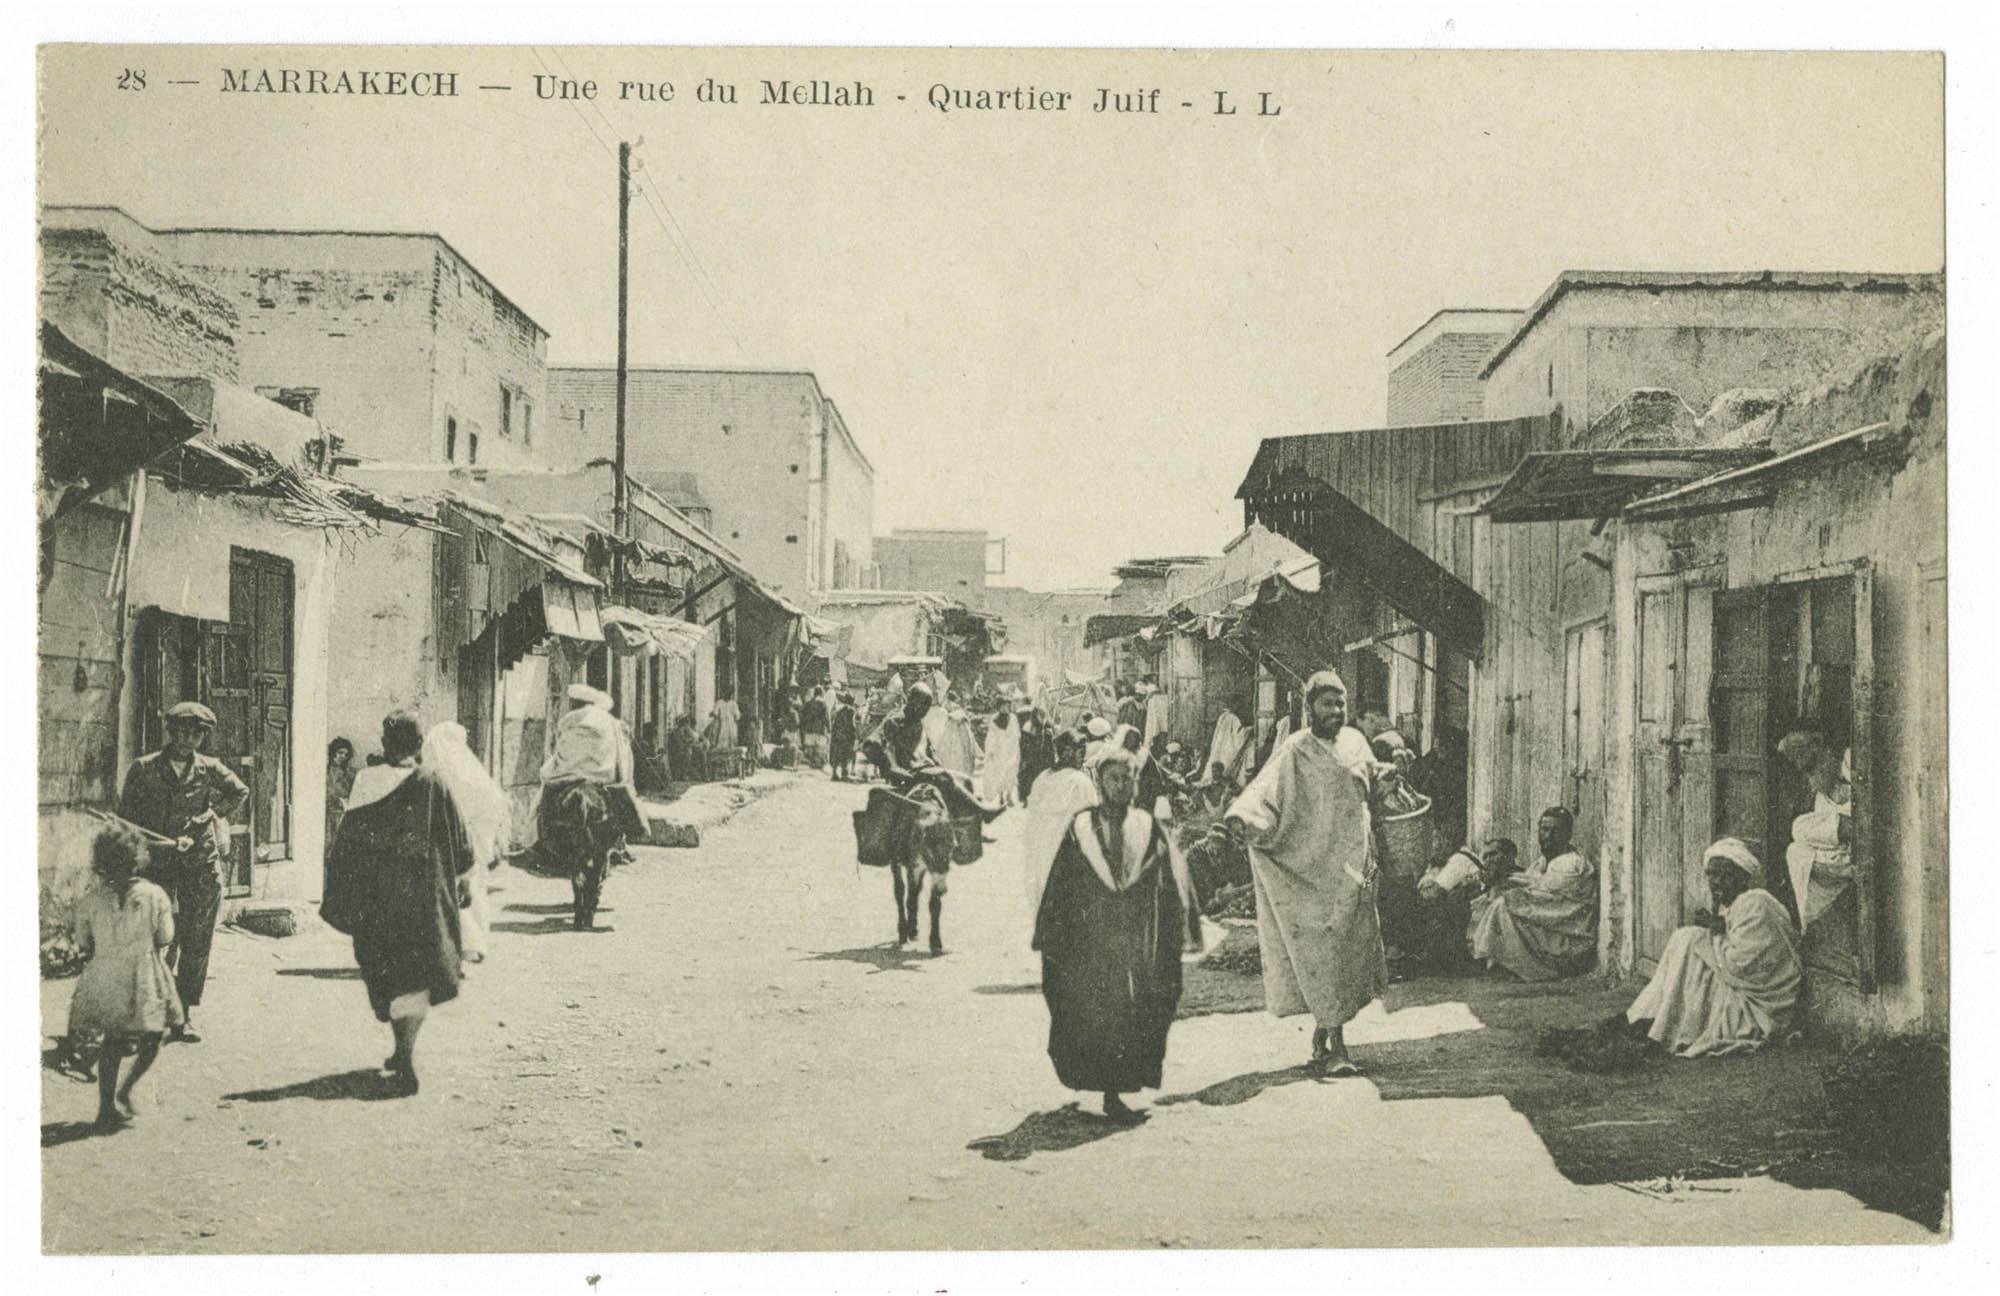 MARRAKECH - Une rue du Mellah - Quartier Juif